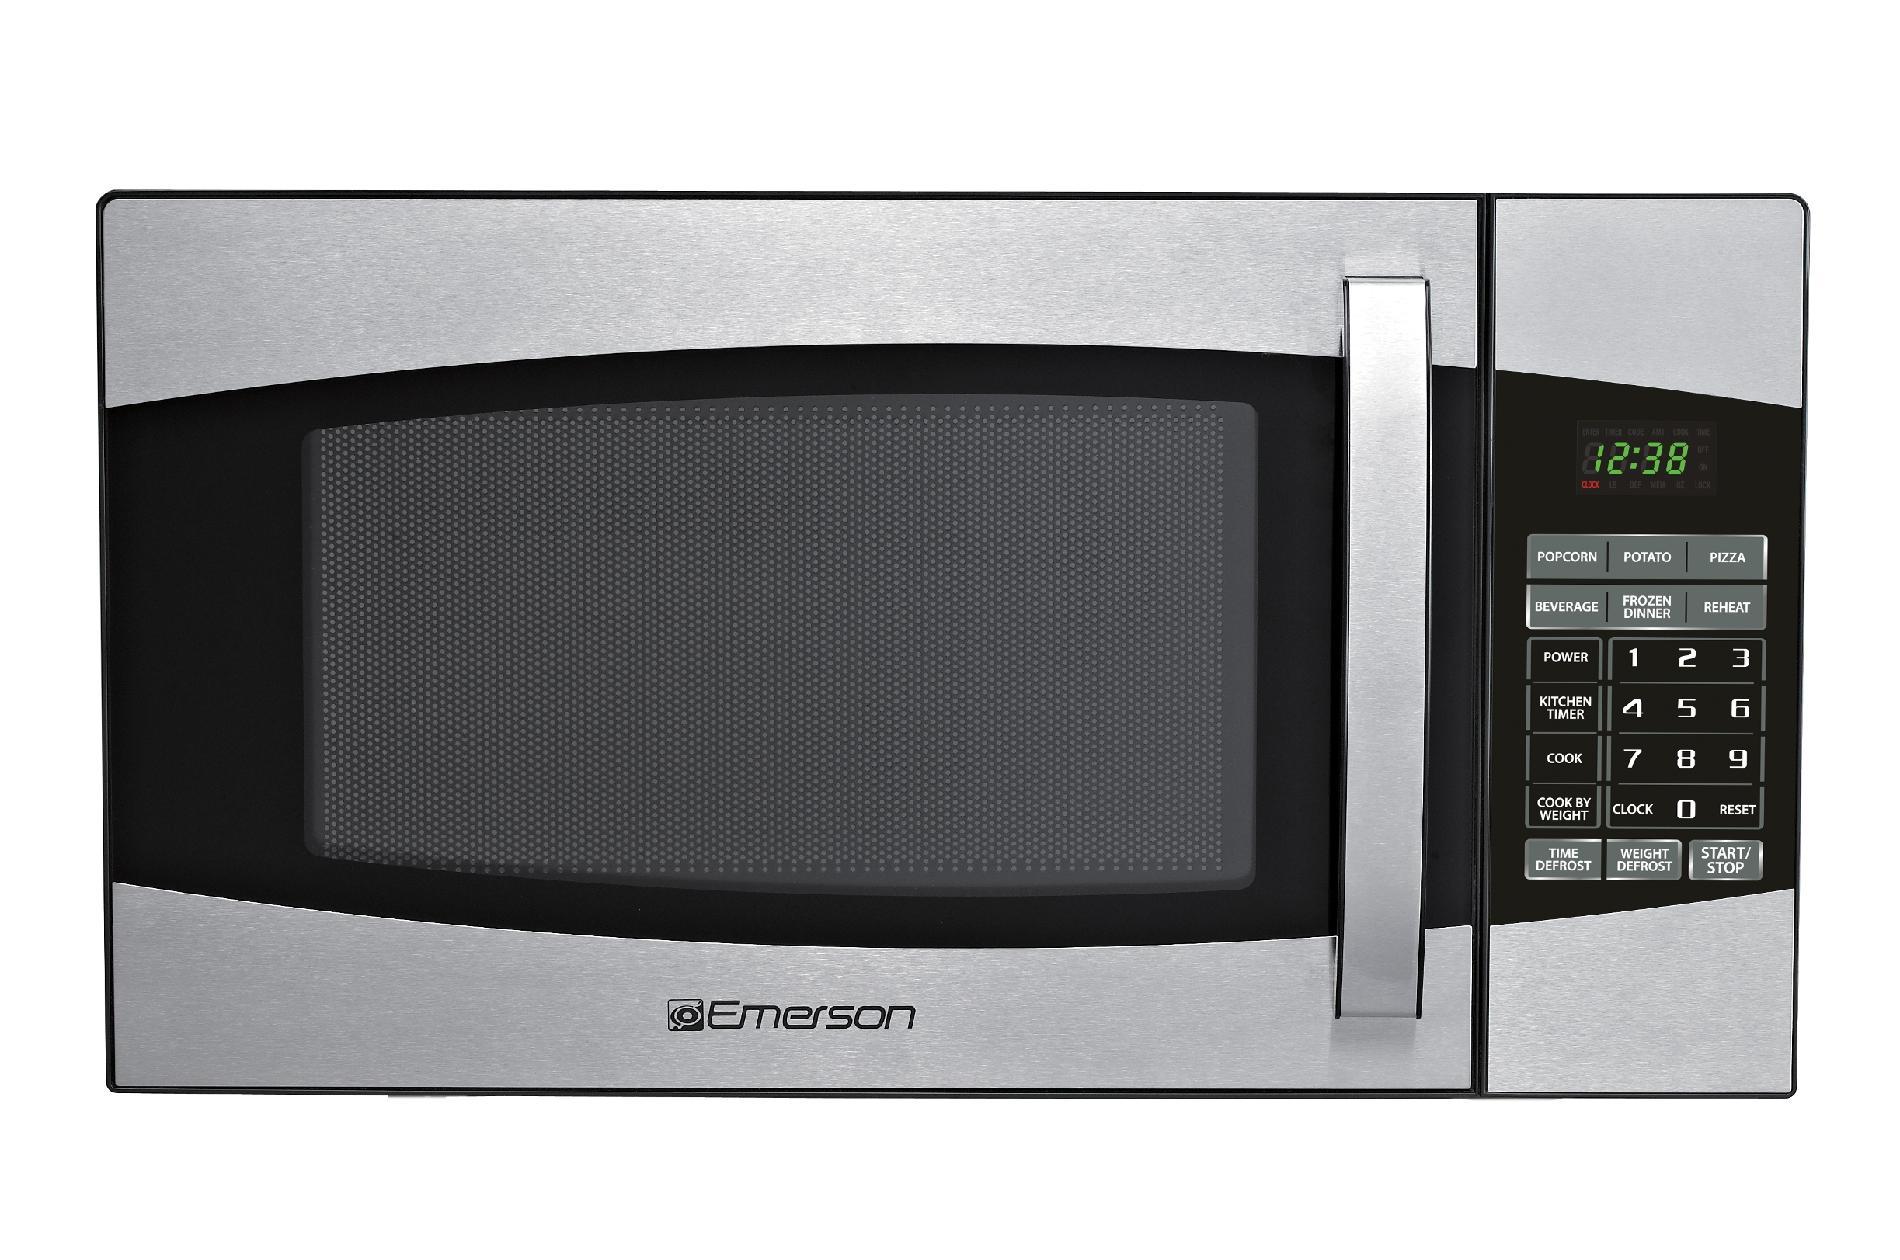 upc 025806033823 emerson 0 9 cu ft 900 watt microwave oven mw9305sb emerson radio corp upcitemdb com